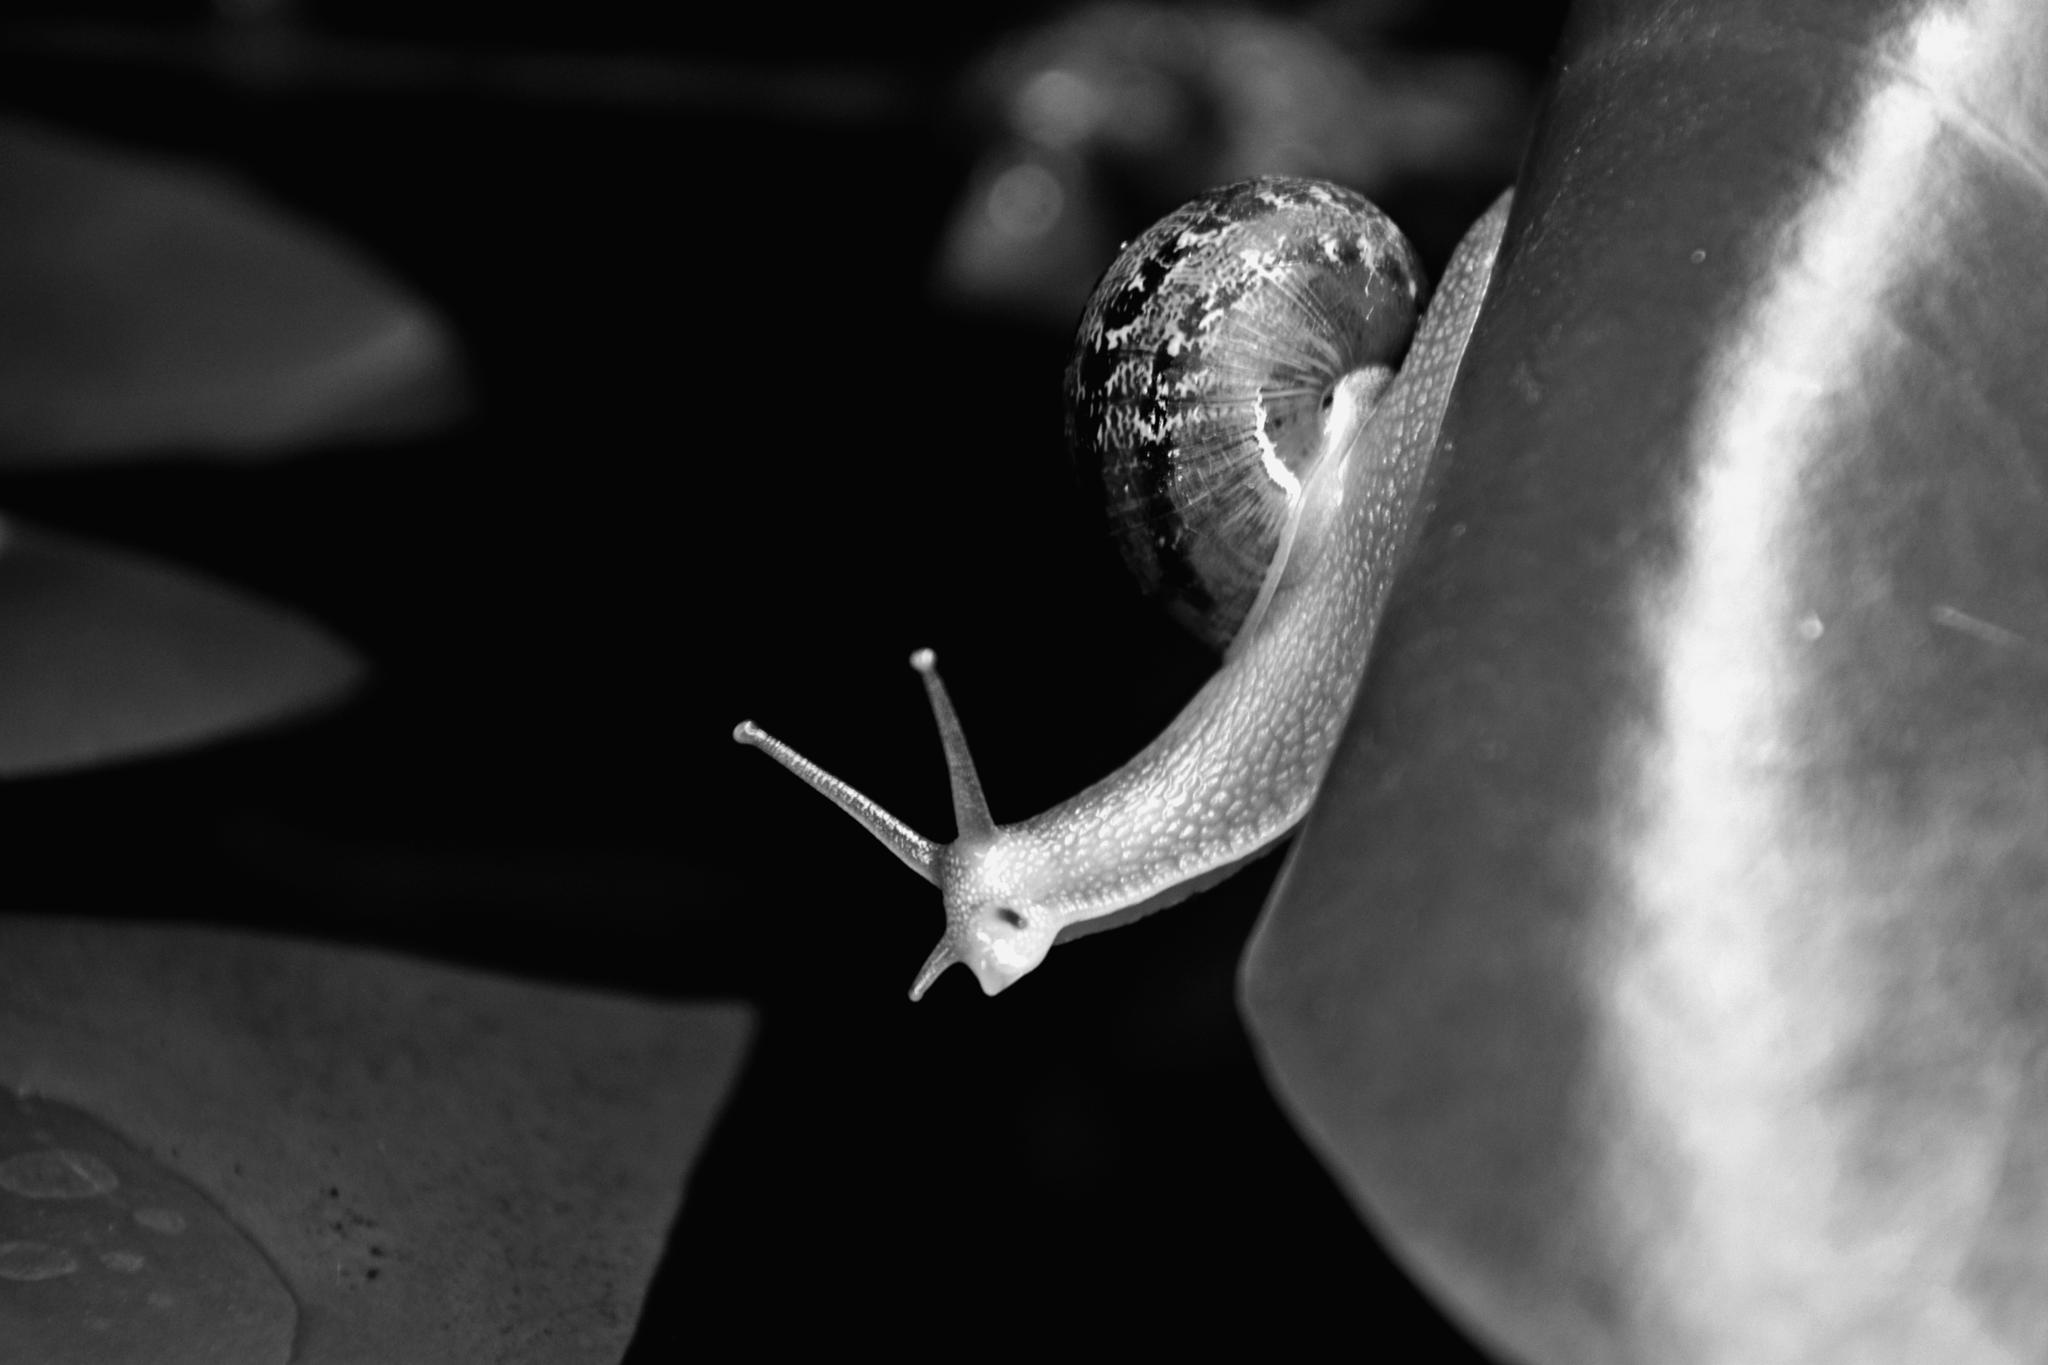 Snail 2 by rick.miller.5817300